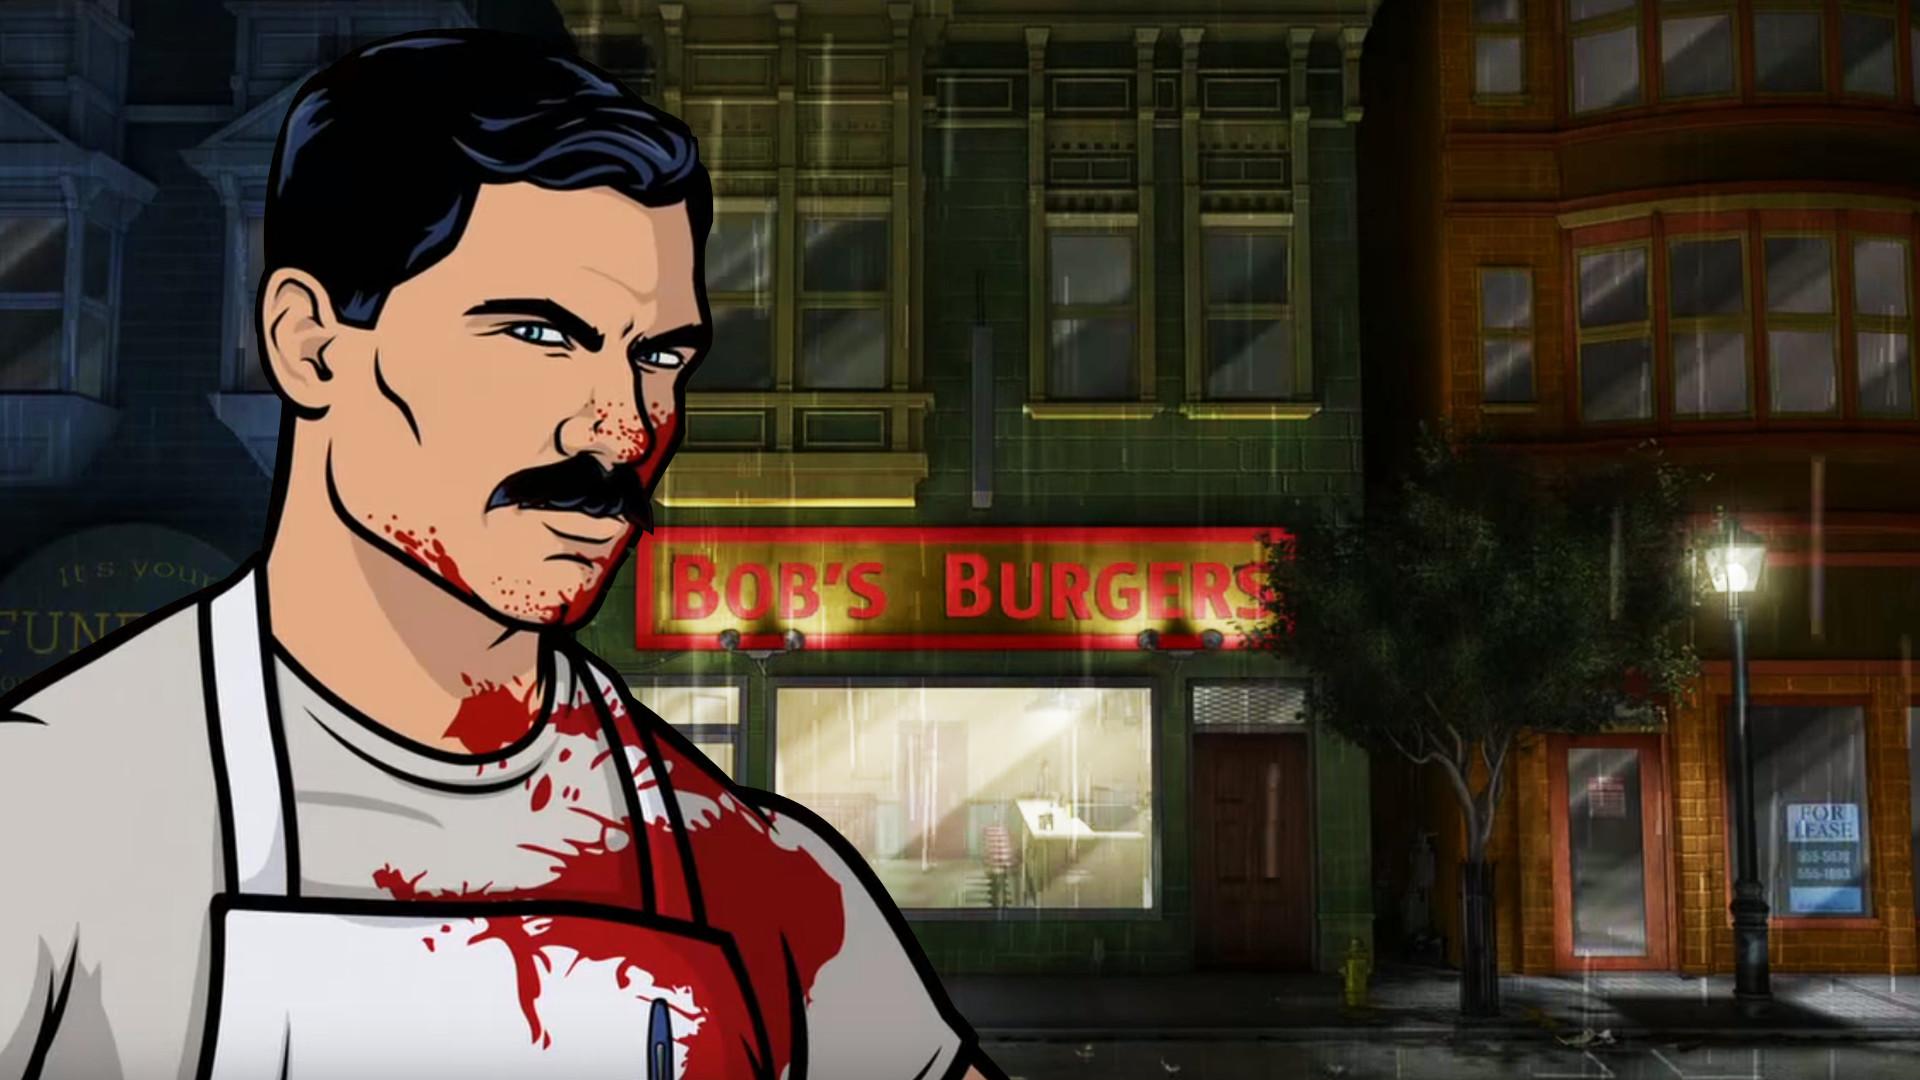 I made a wallpaper using the Archer/Bob's Burgers Episode!